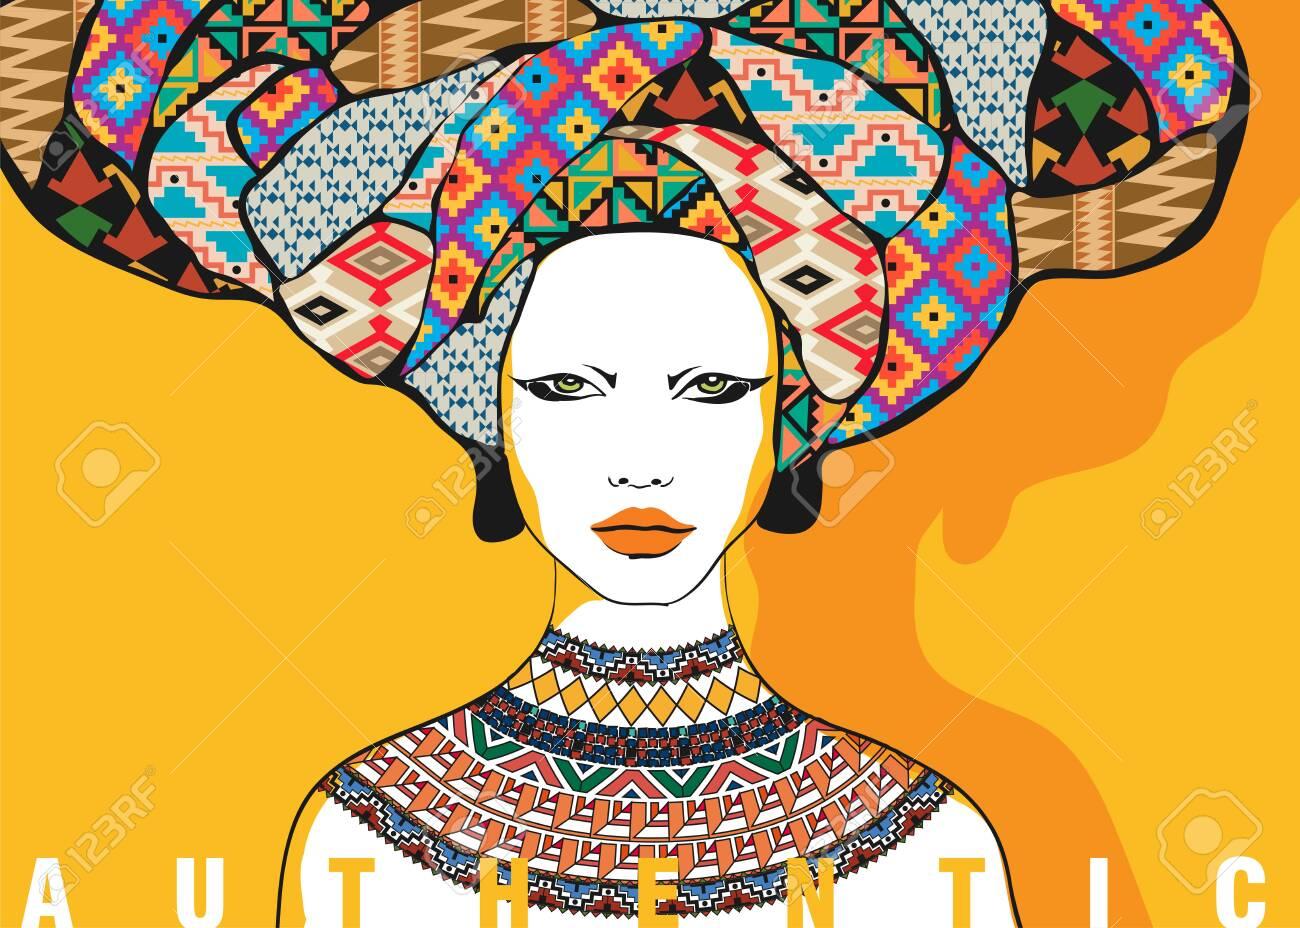 Conceptual fashionable illustration. Female portrait in ethnic style. Graphic art - 128370689